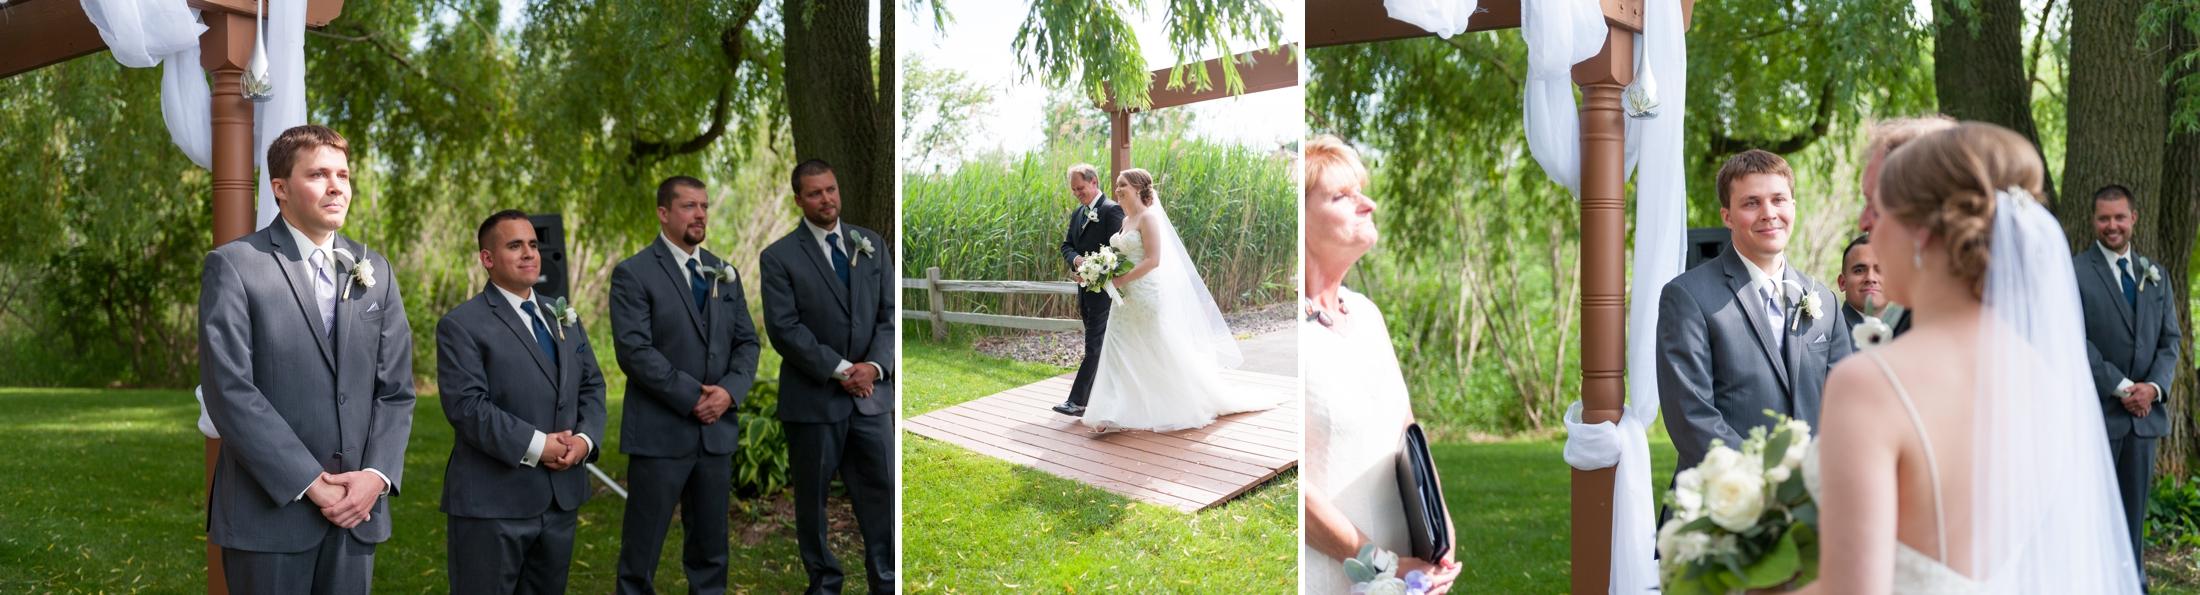 Best Wisconsin Wedding Photographer, The Marq Green Bay